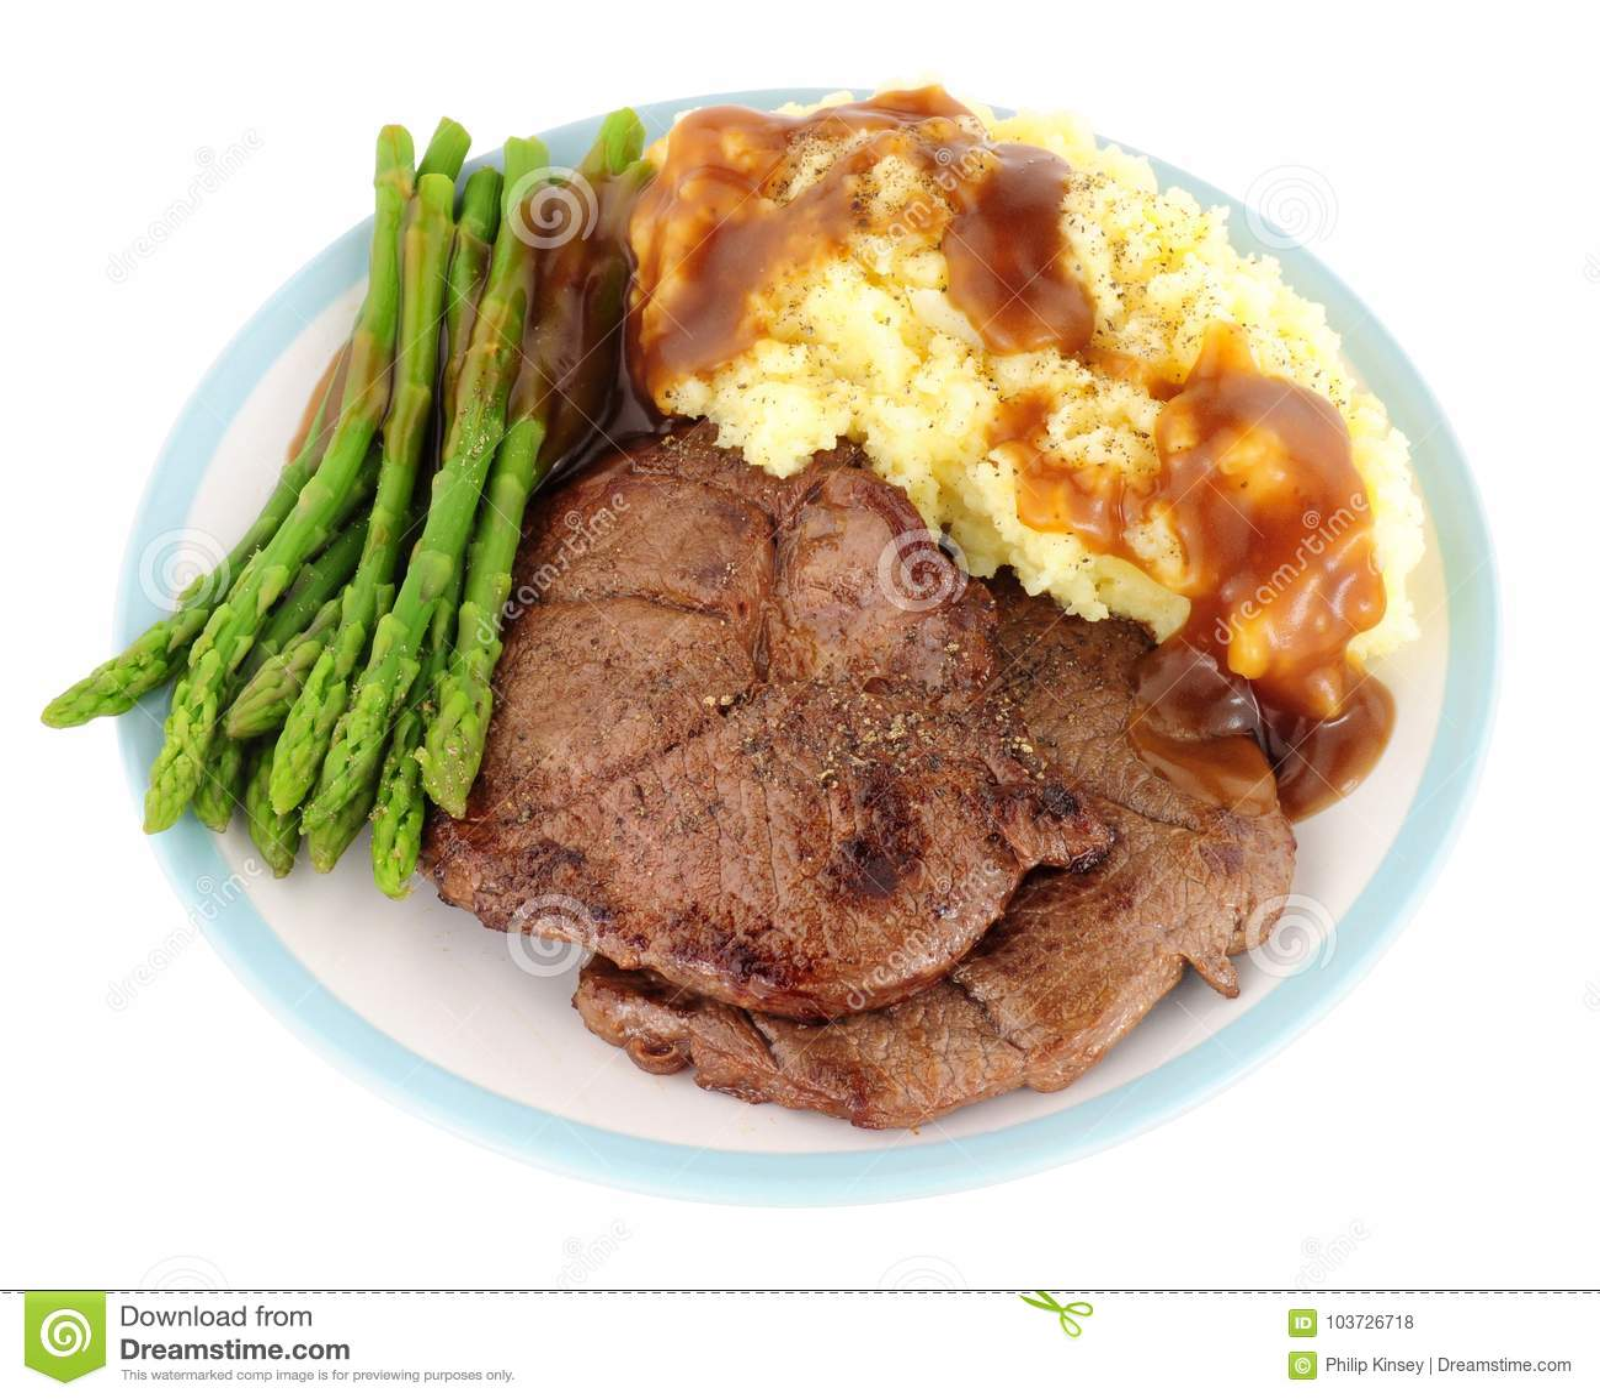 Fried Venison Steak Meal